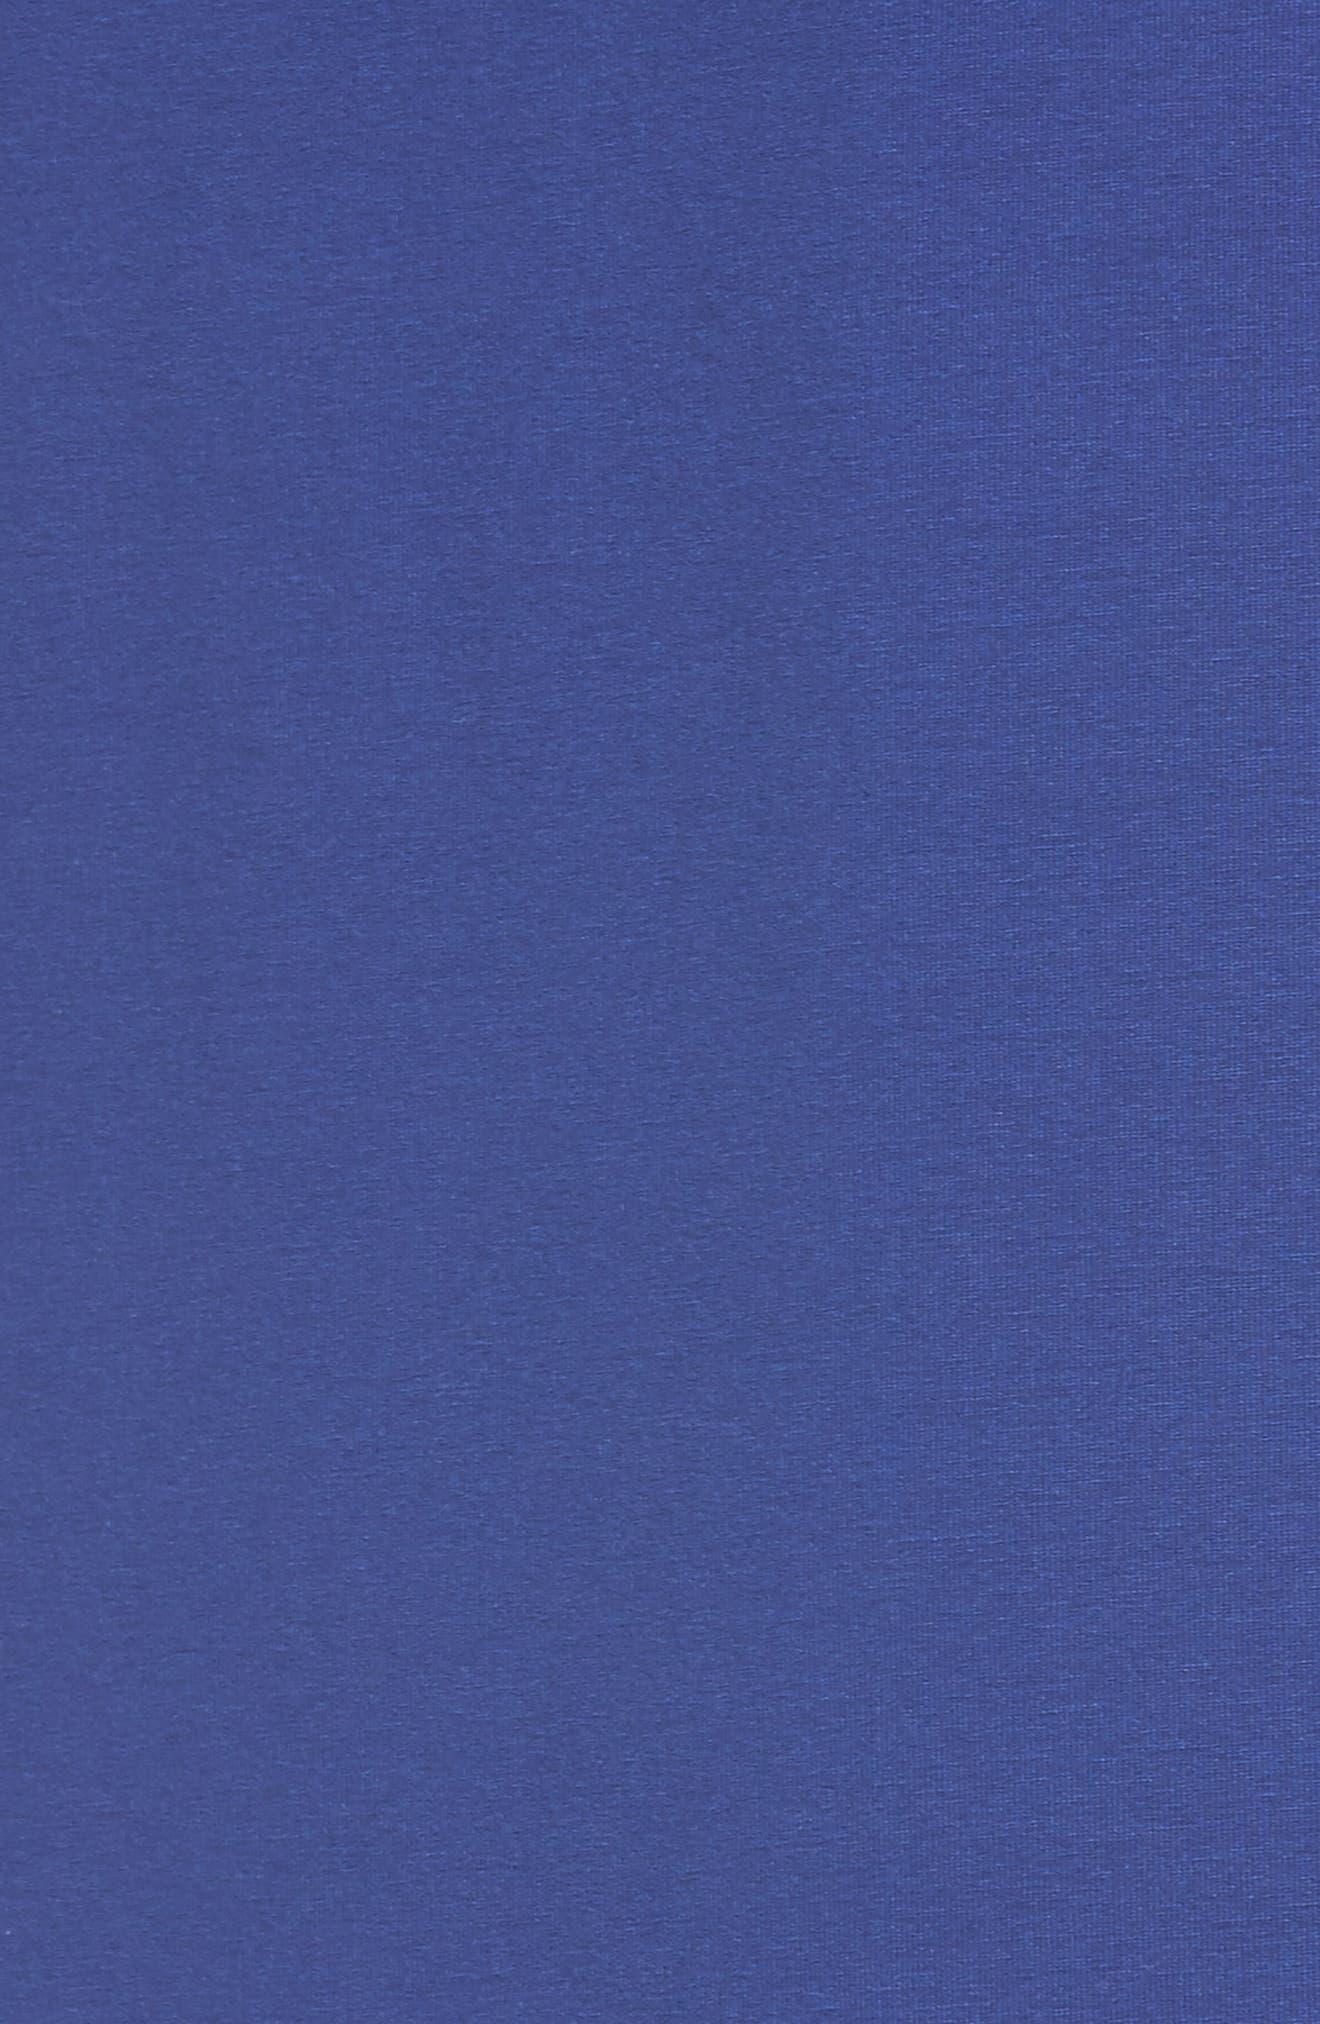 Jersey Shift Dress,                             Alternate thumbnail 6, color,                             Persian Blue